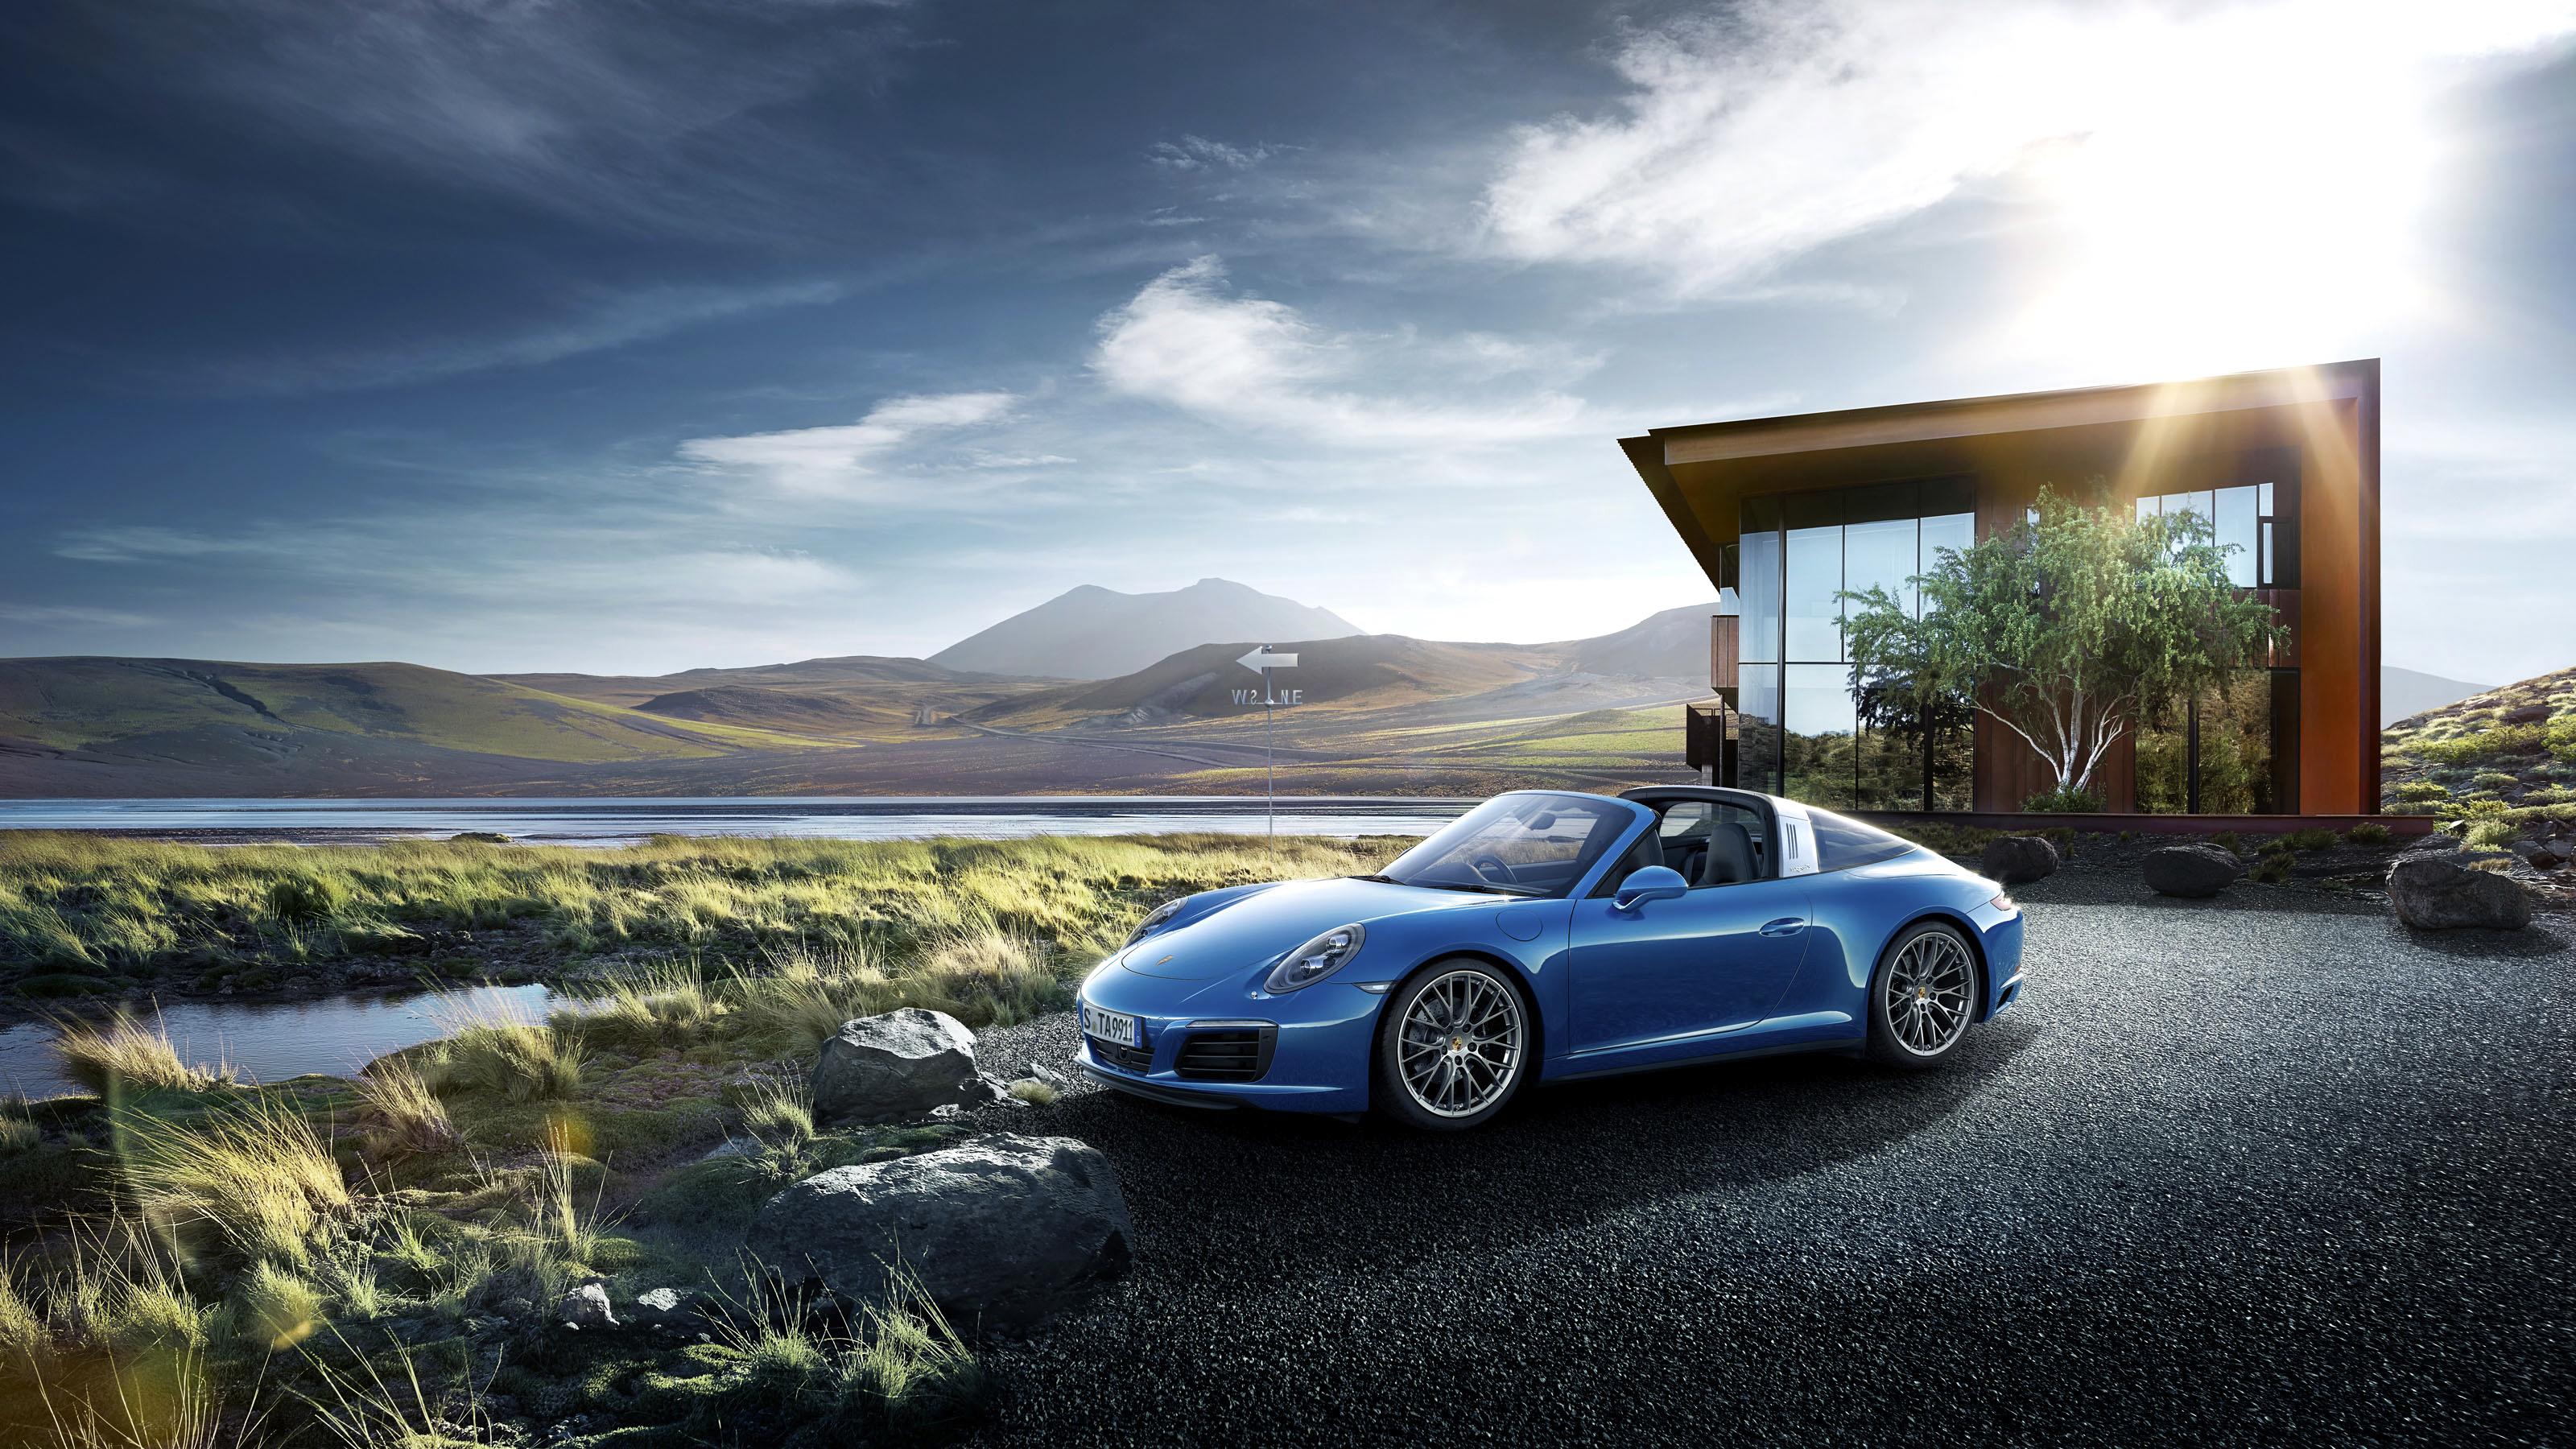 Porsche 911 Targa HD Wallpaper Background Image 3200x1800 ID 3200x1800